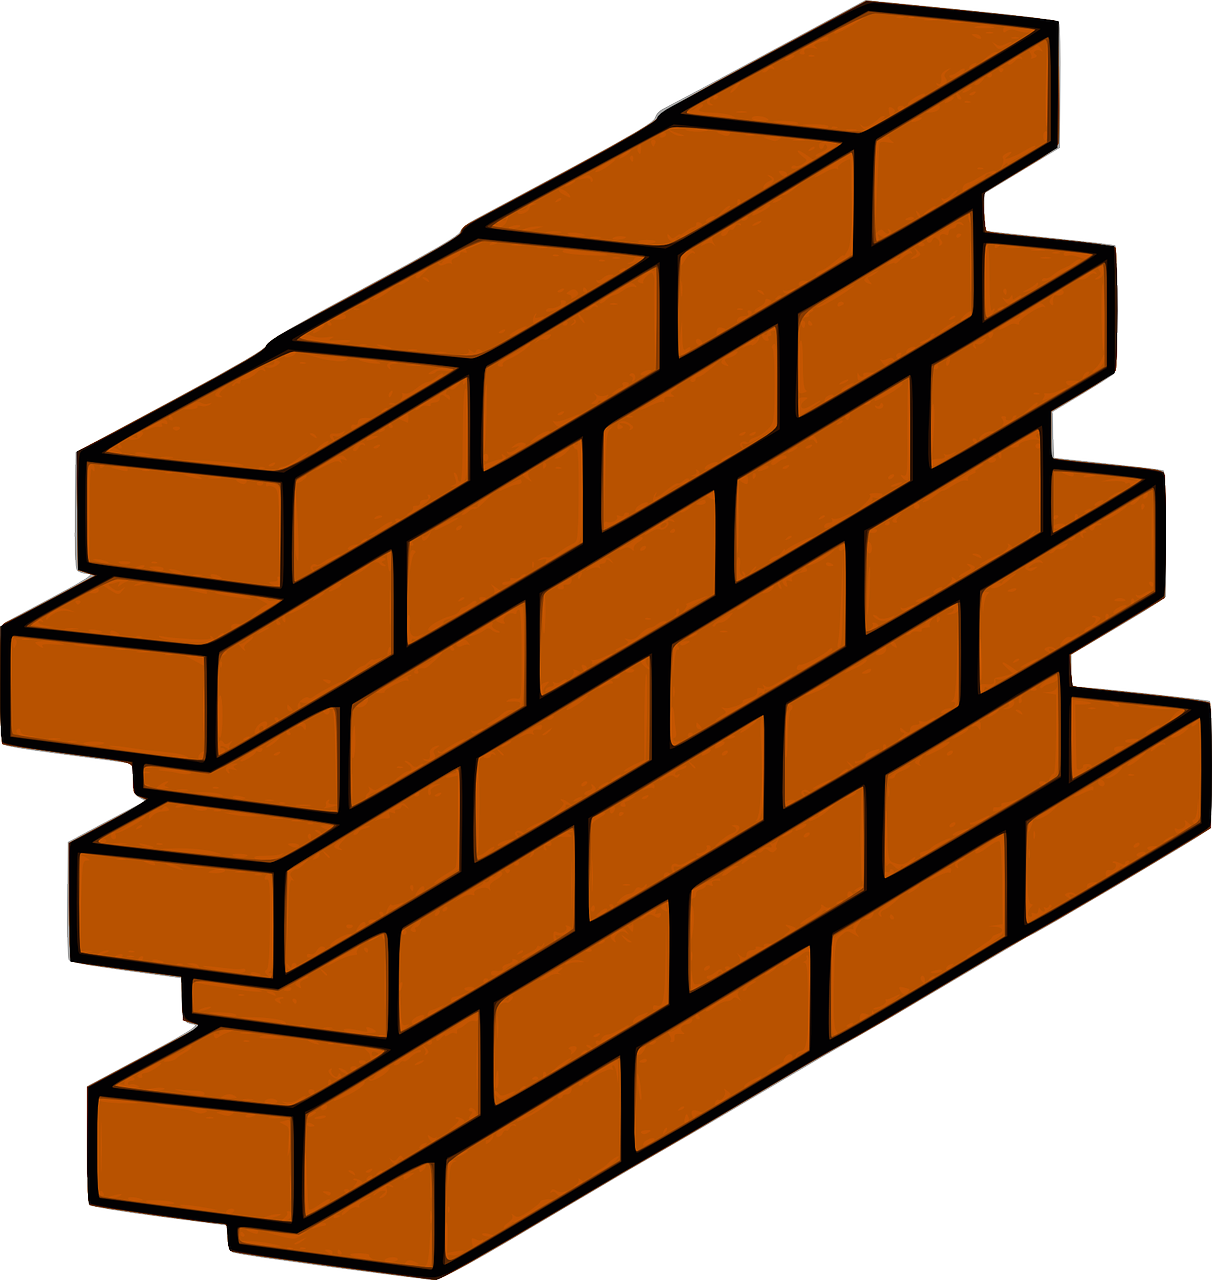 brick-158629_1280.png